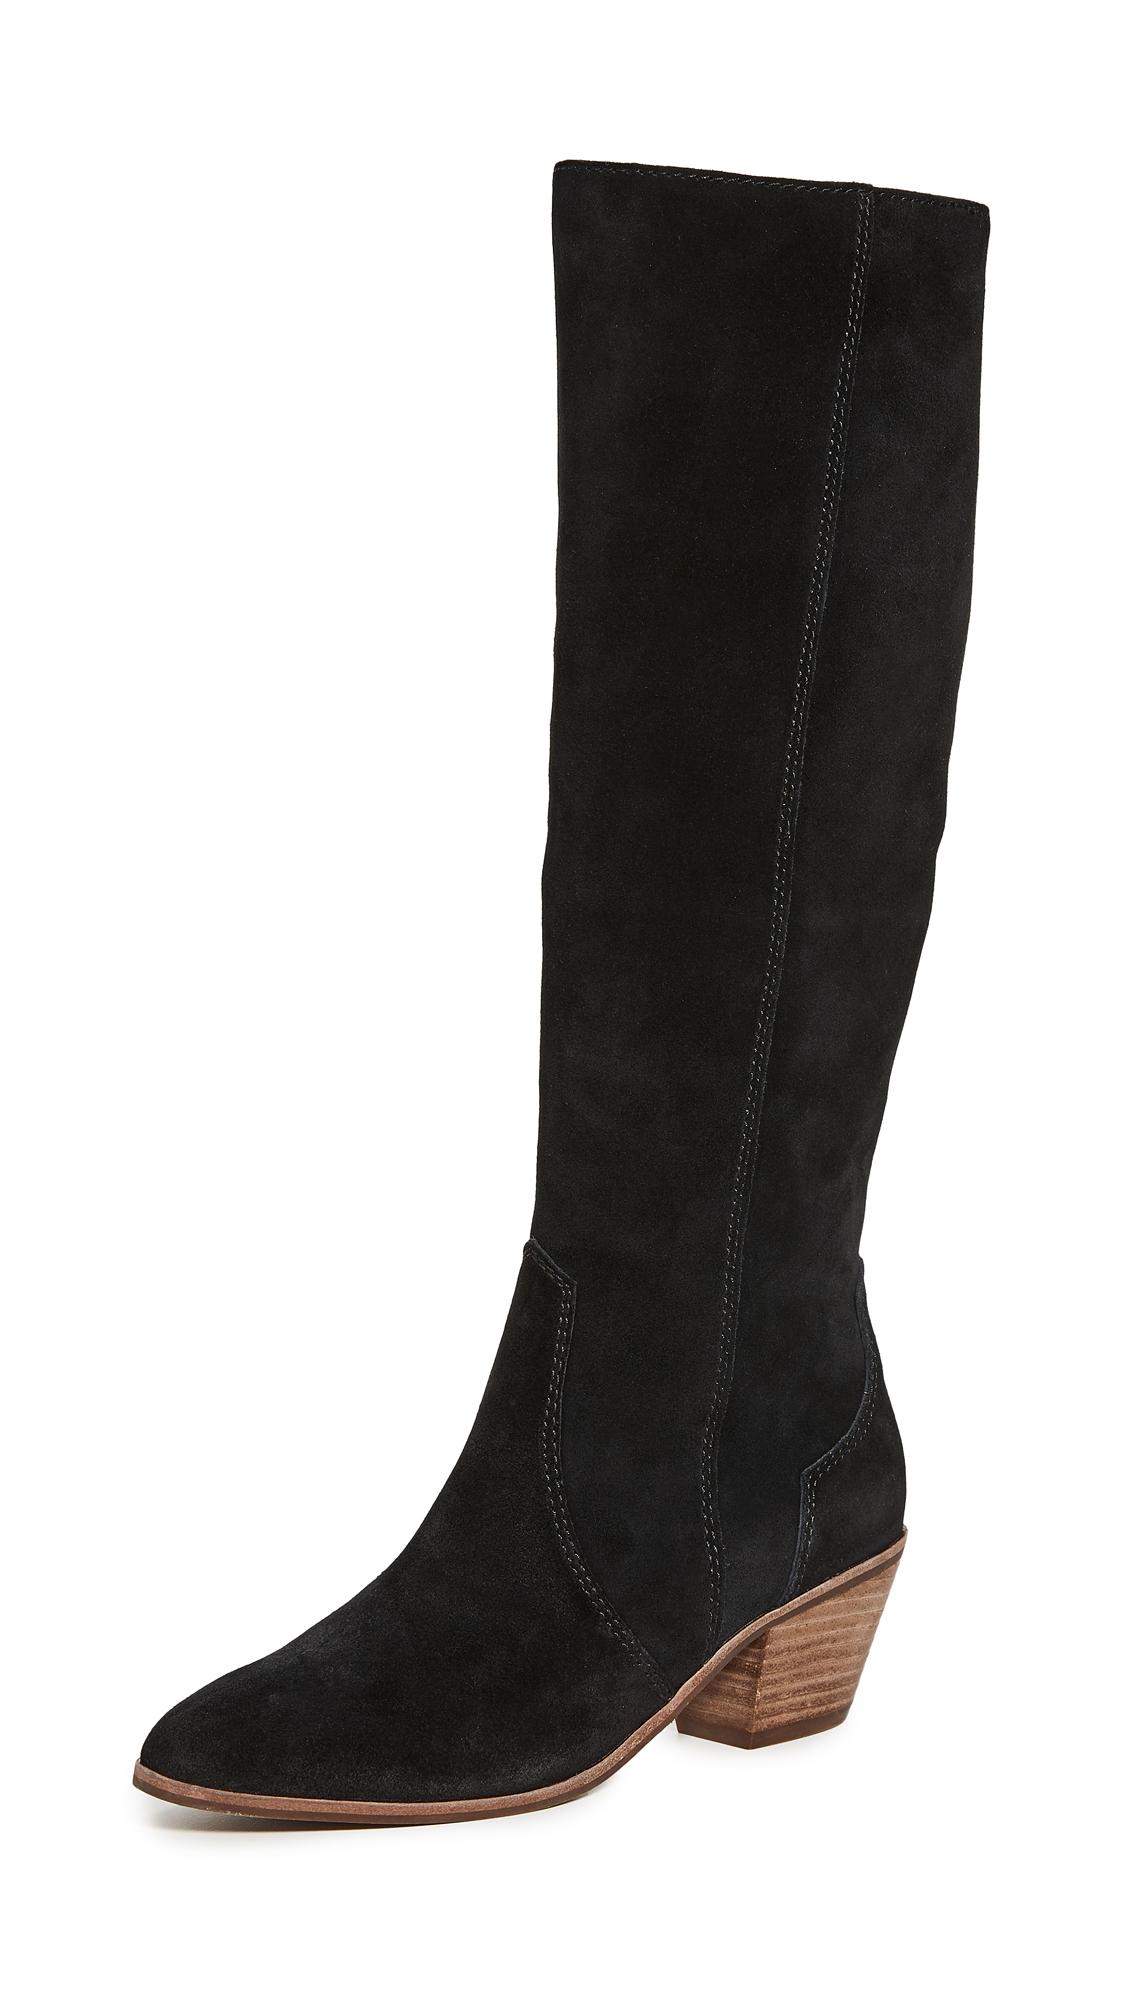 Madewell Greta Tall Western Boots – 70% Off Sale